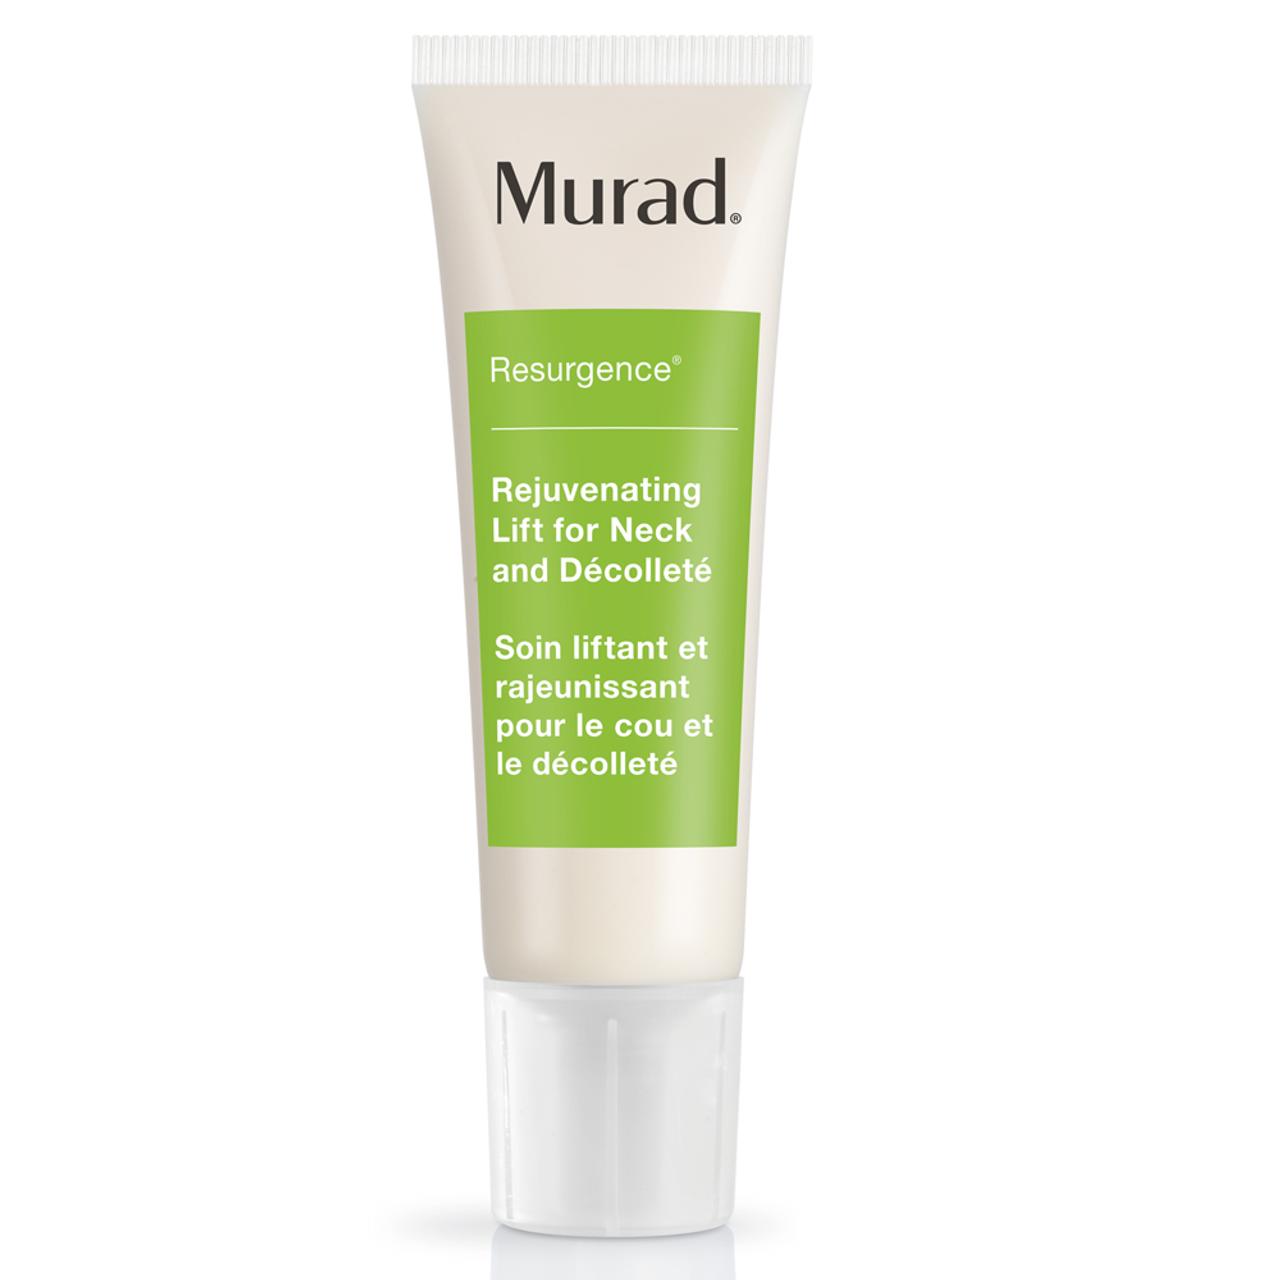 Murad Resurgence™ Rejuvenating Lift for Neck and Decollete